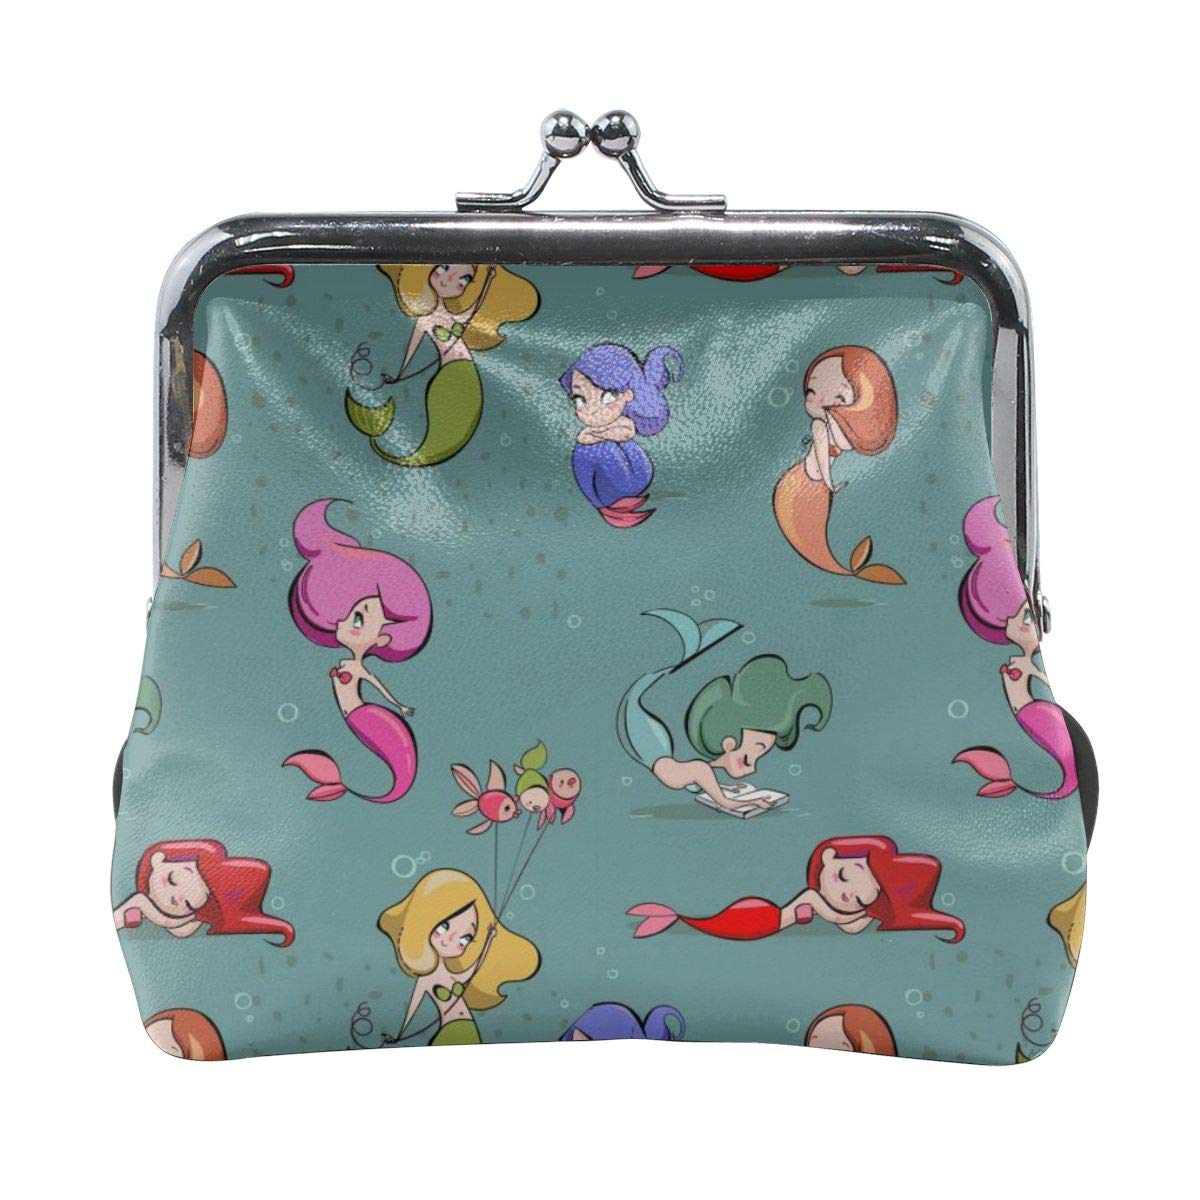 Cute Cartoon Mermaids Cute Buckle Coin Purses Buckle Buckle Change Purse Wallets